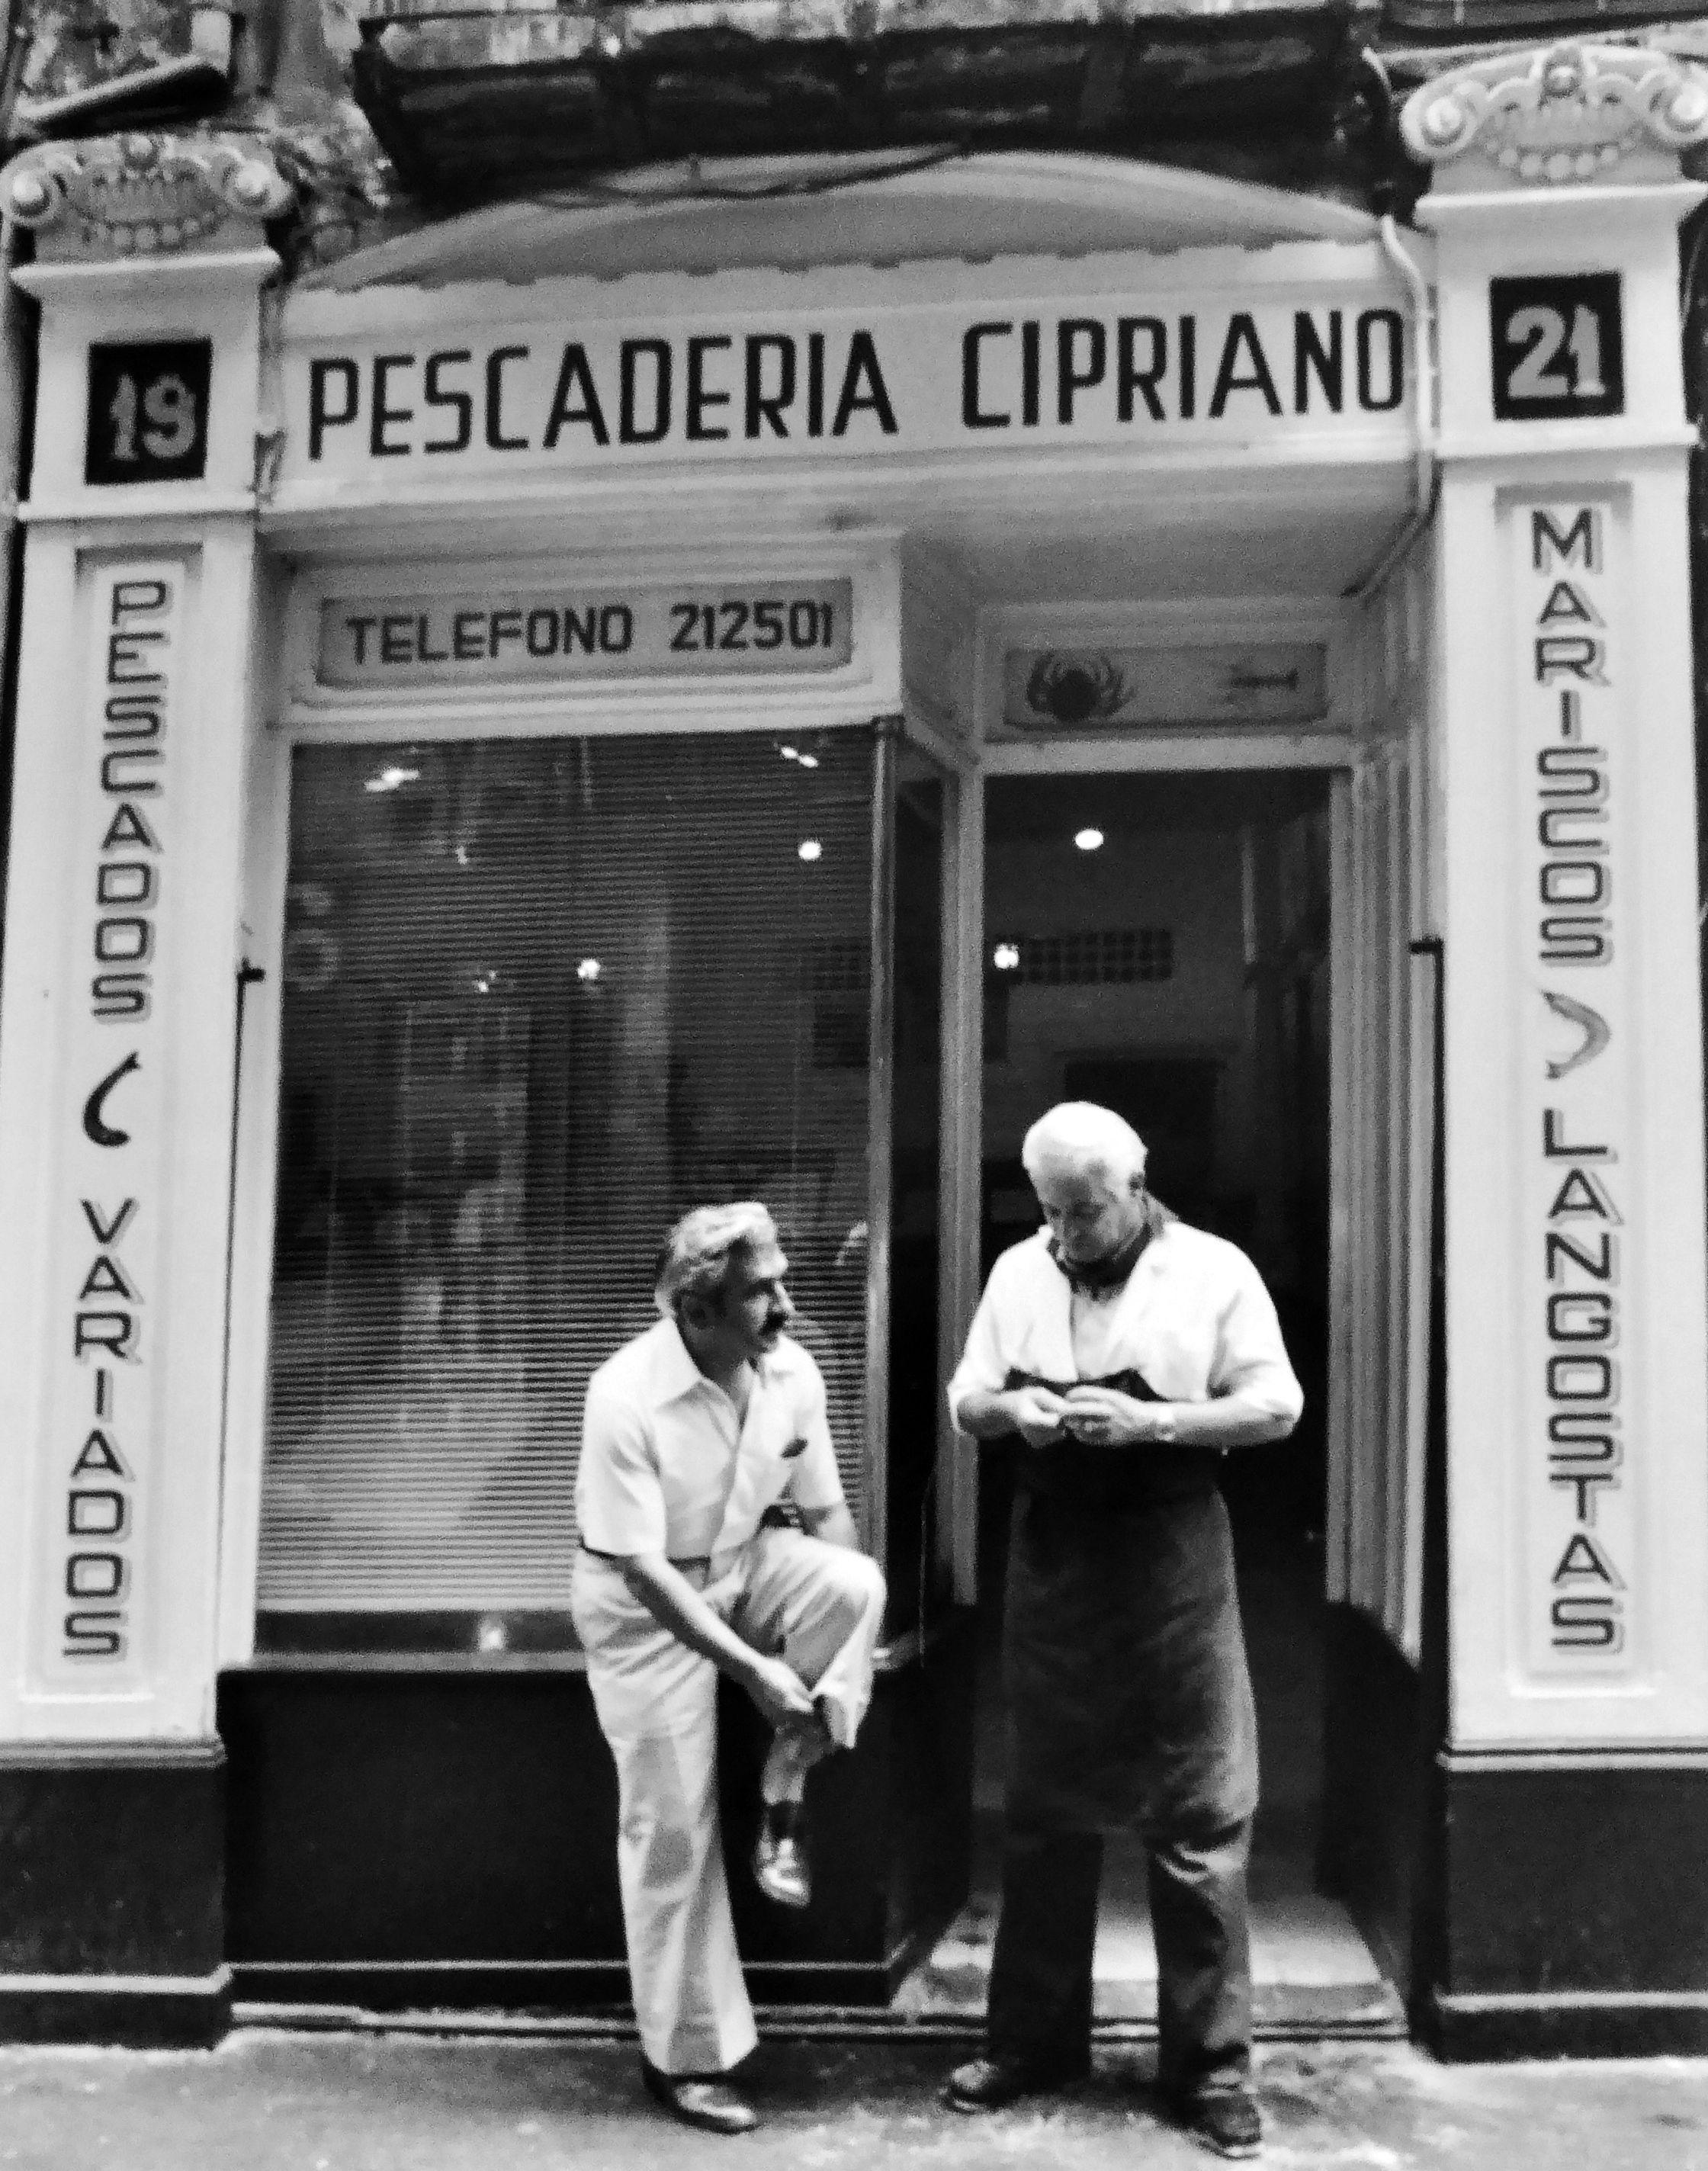 Pescader A Cipriano Fotograf A Antigua Pamplona Pinterest # Muebles Cipriano